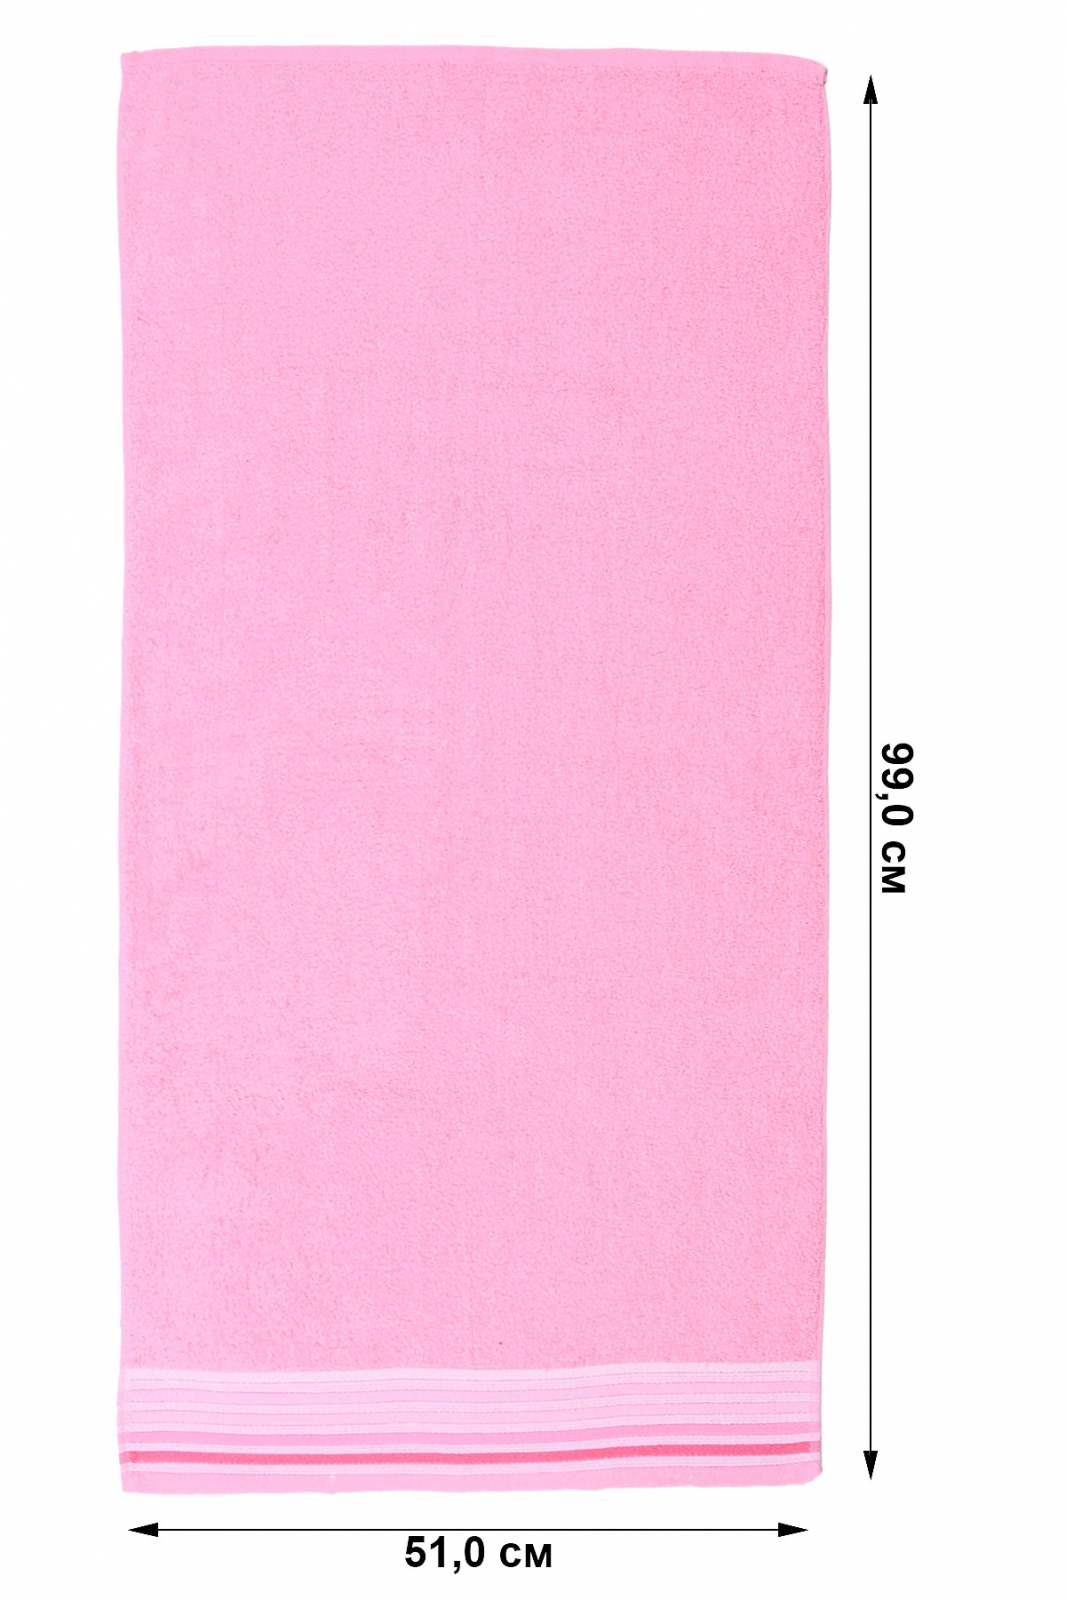 Купить розовое полотенце